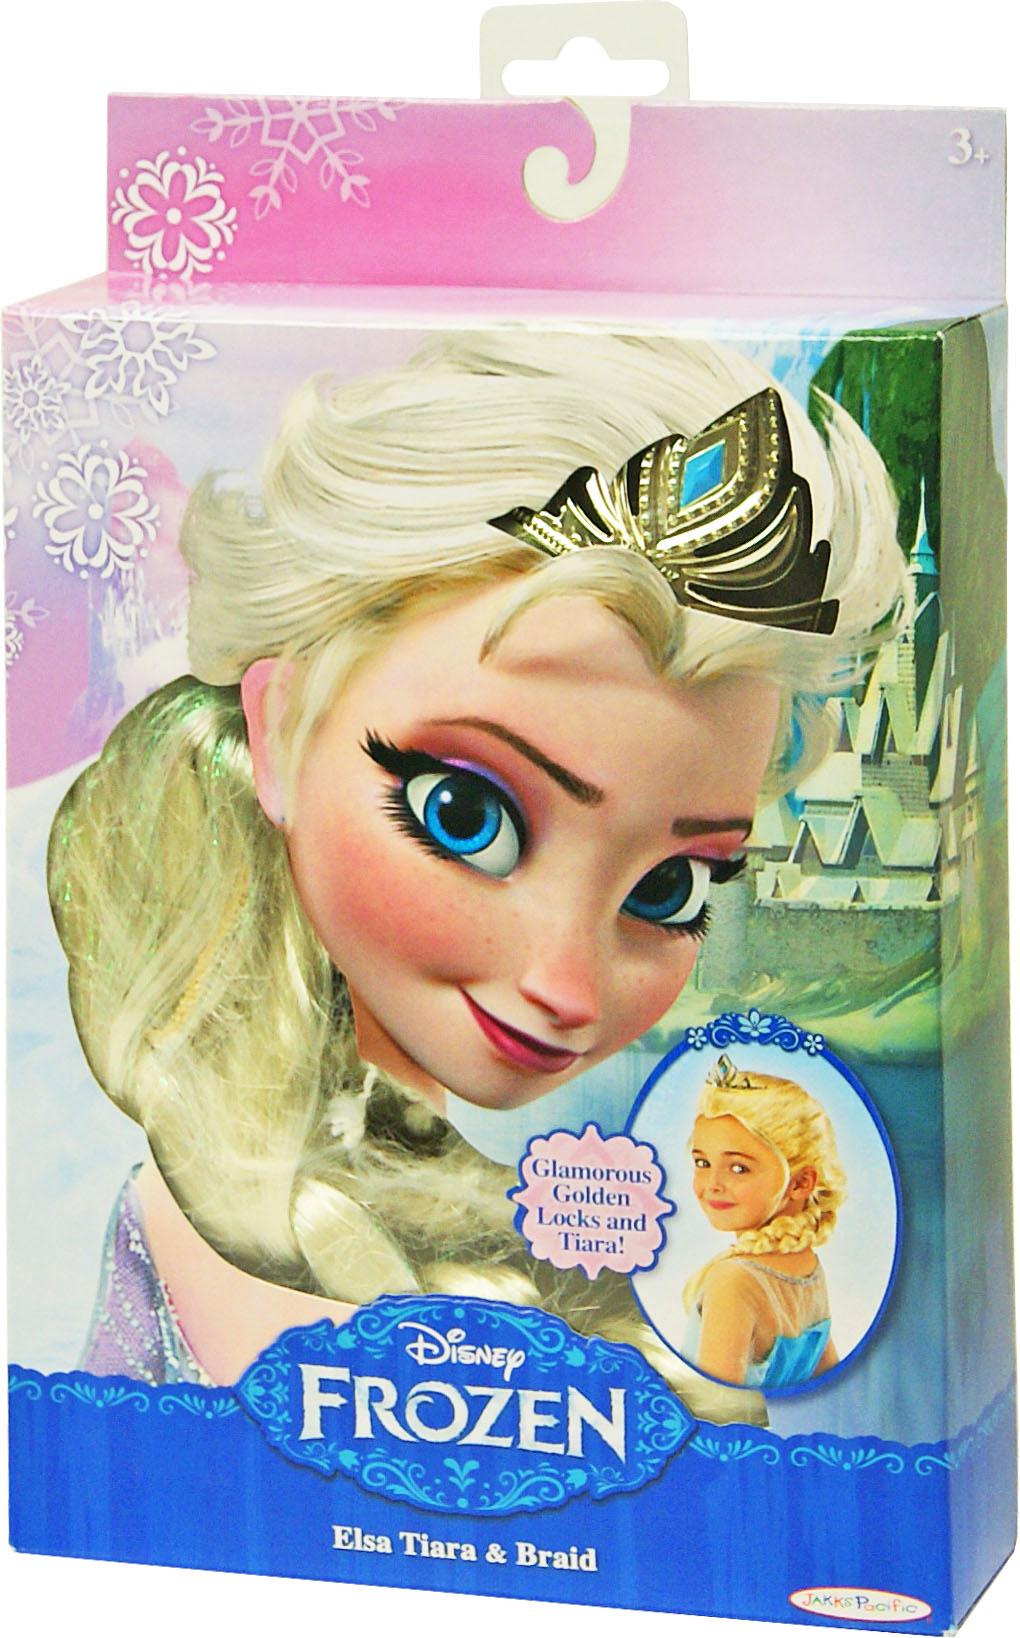 Іграшка перука Frozen Ельза арт.75902/2 блістер 17,78*27,94*5,08см